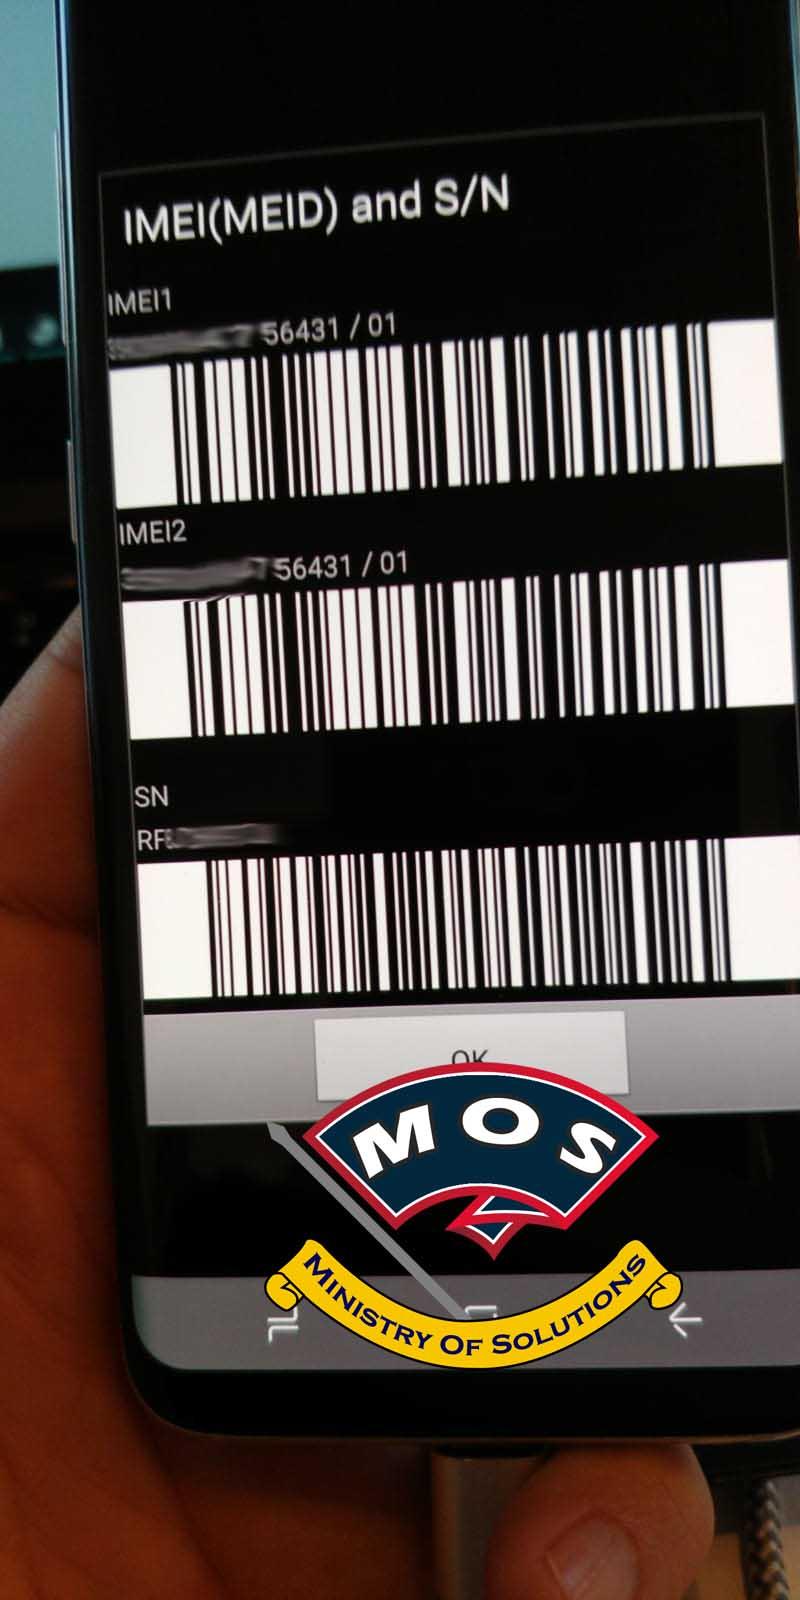 Samsung Galaxy S8 Convert to Dual Sim (Permanent) - Ministry